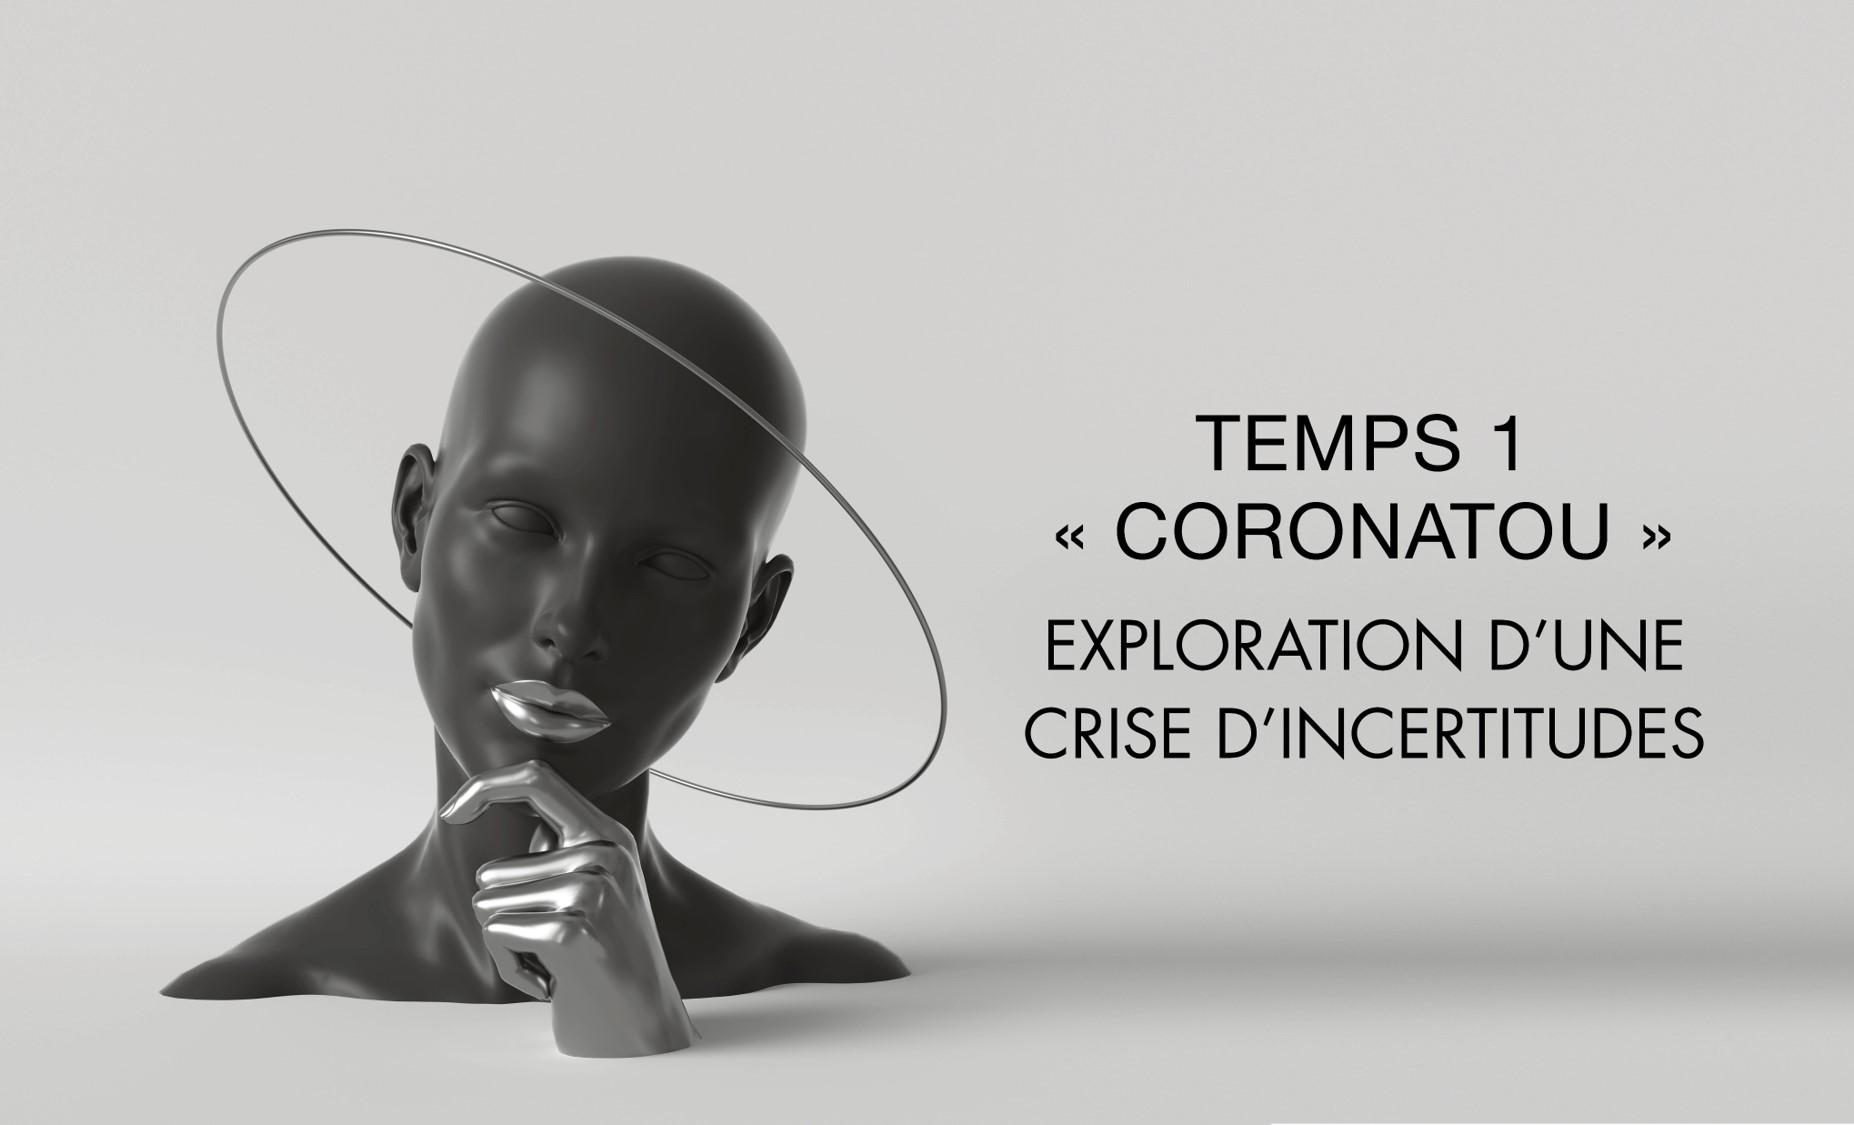 Étude COVID19 – Chapitre I «Coronatou»